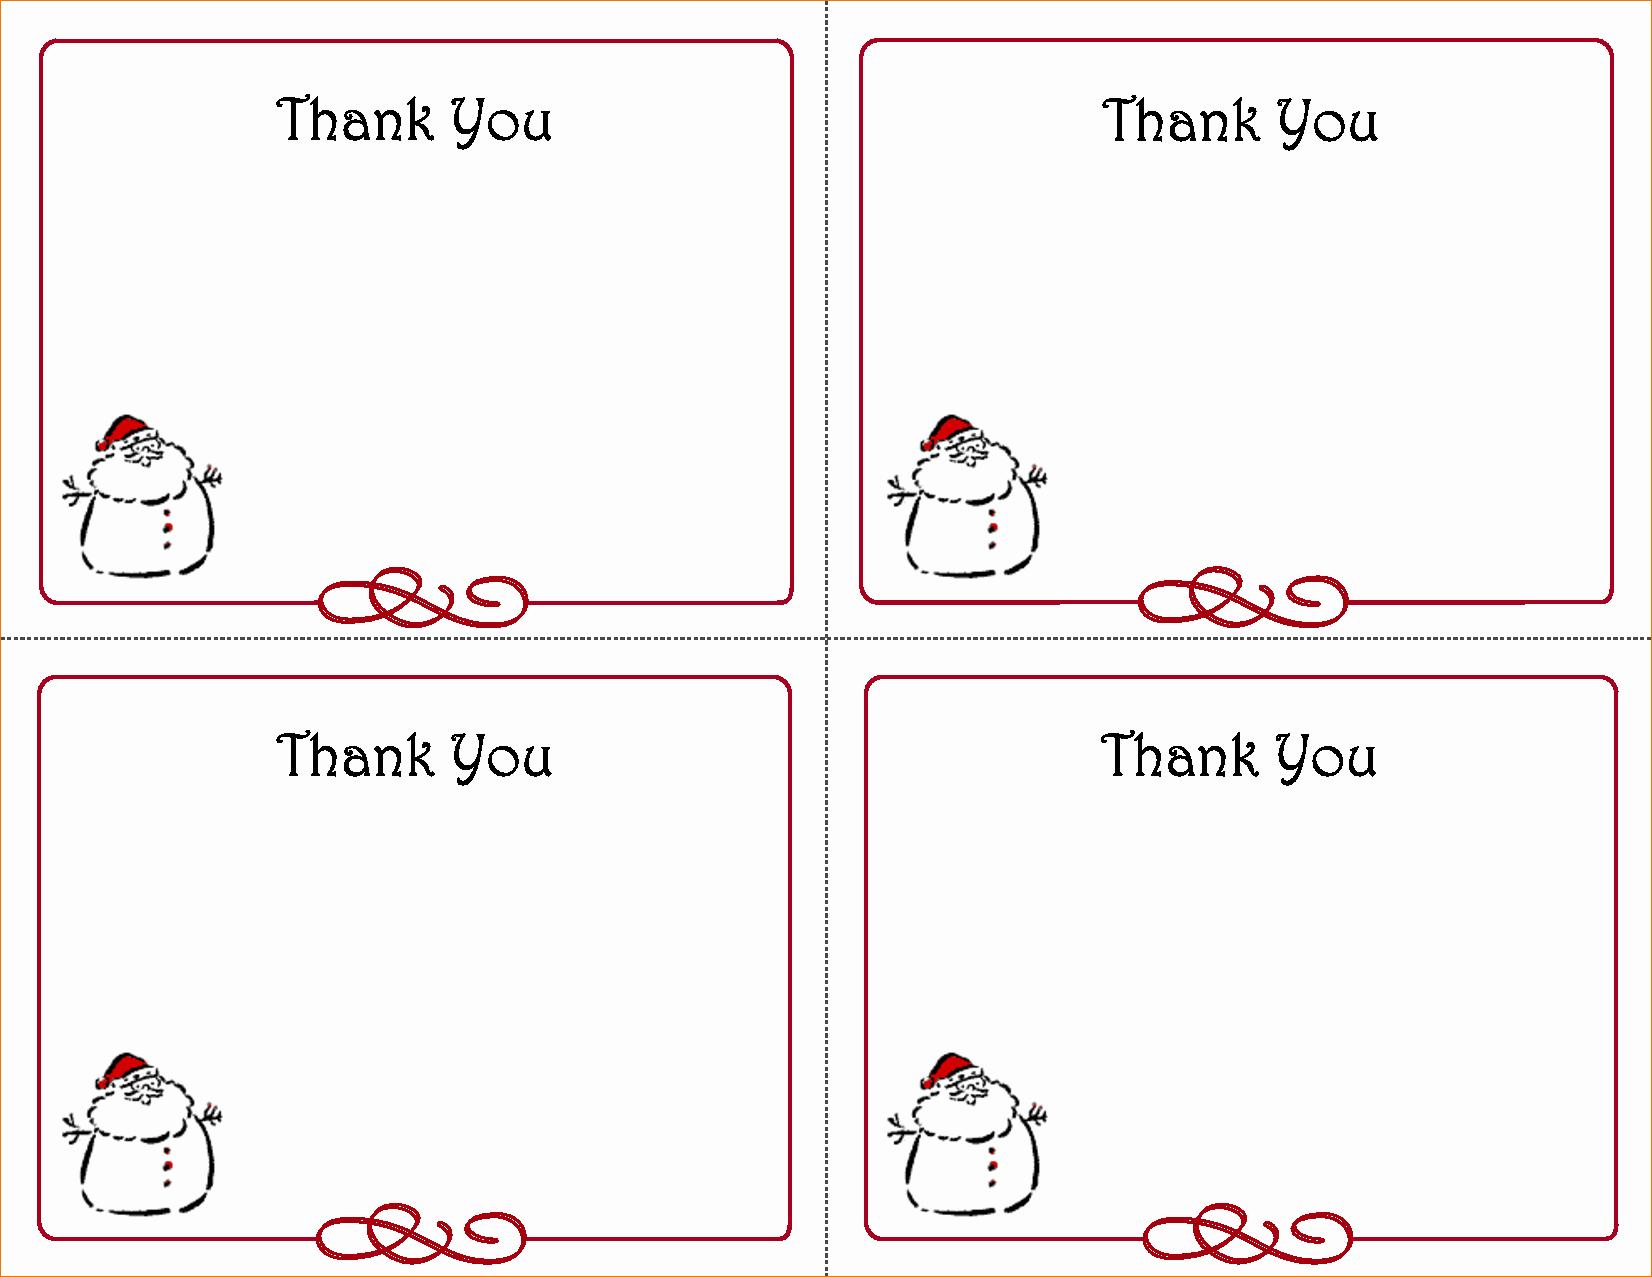 Photo Thank You Card Template Beautiful 5 Free Thank You Card Template